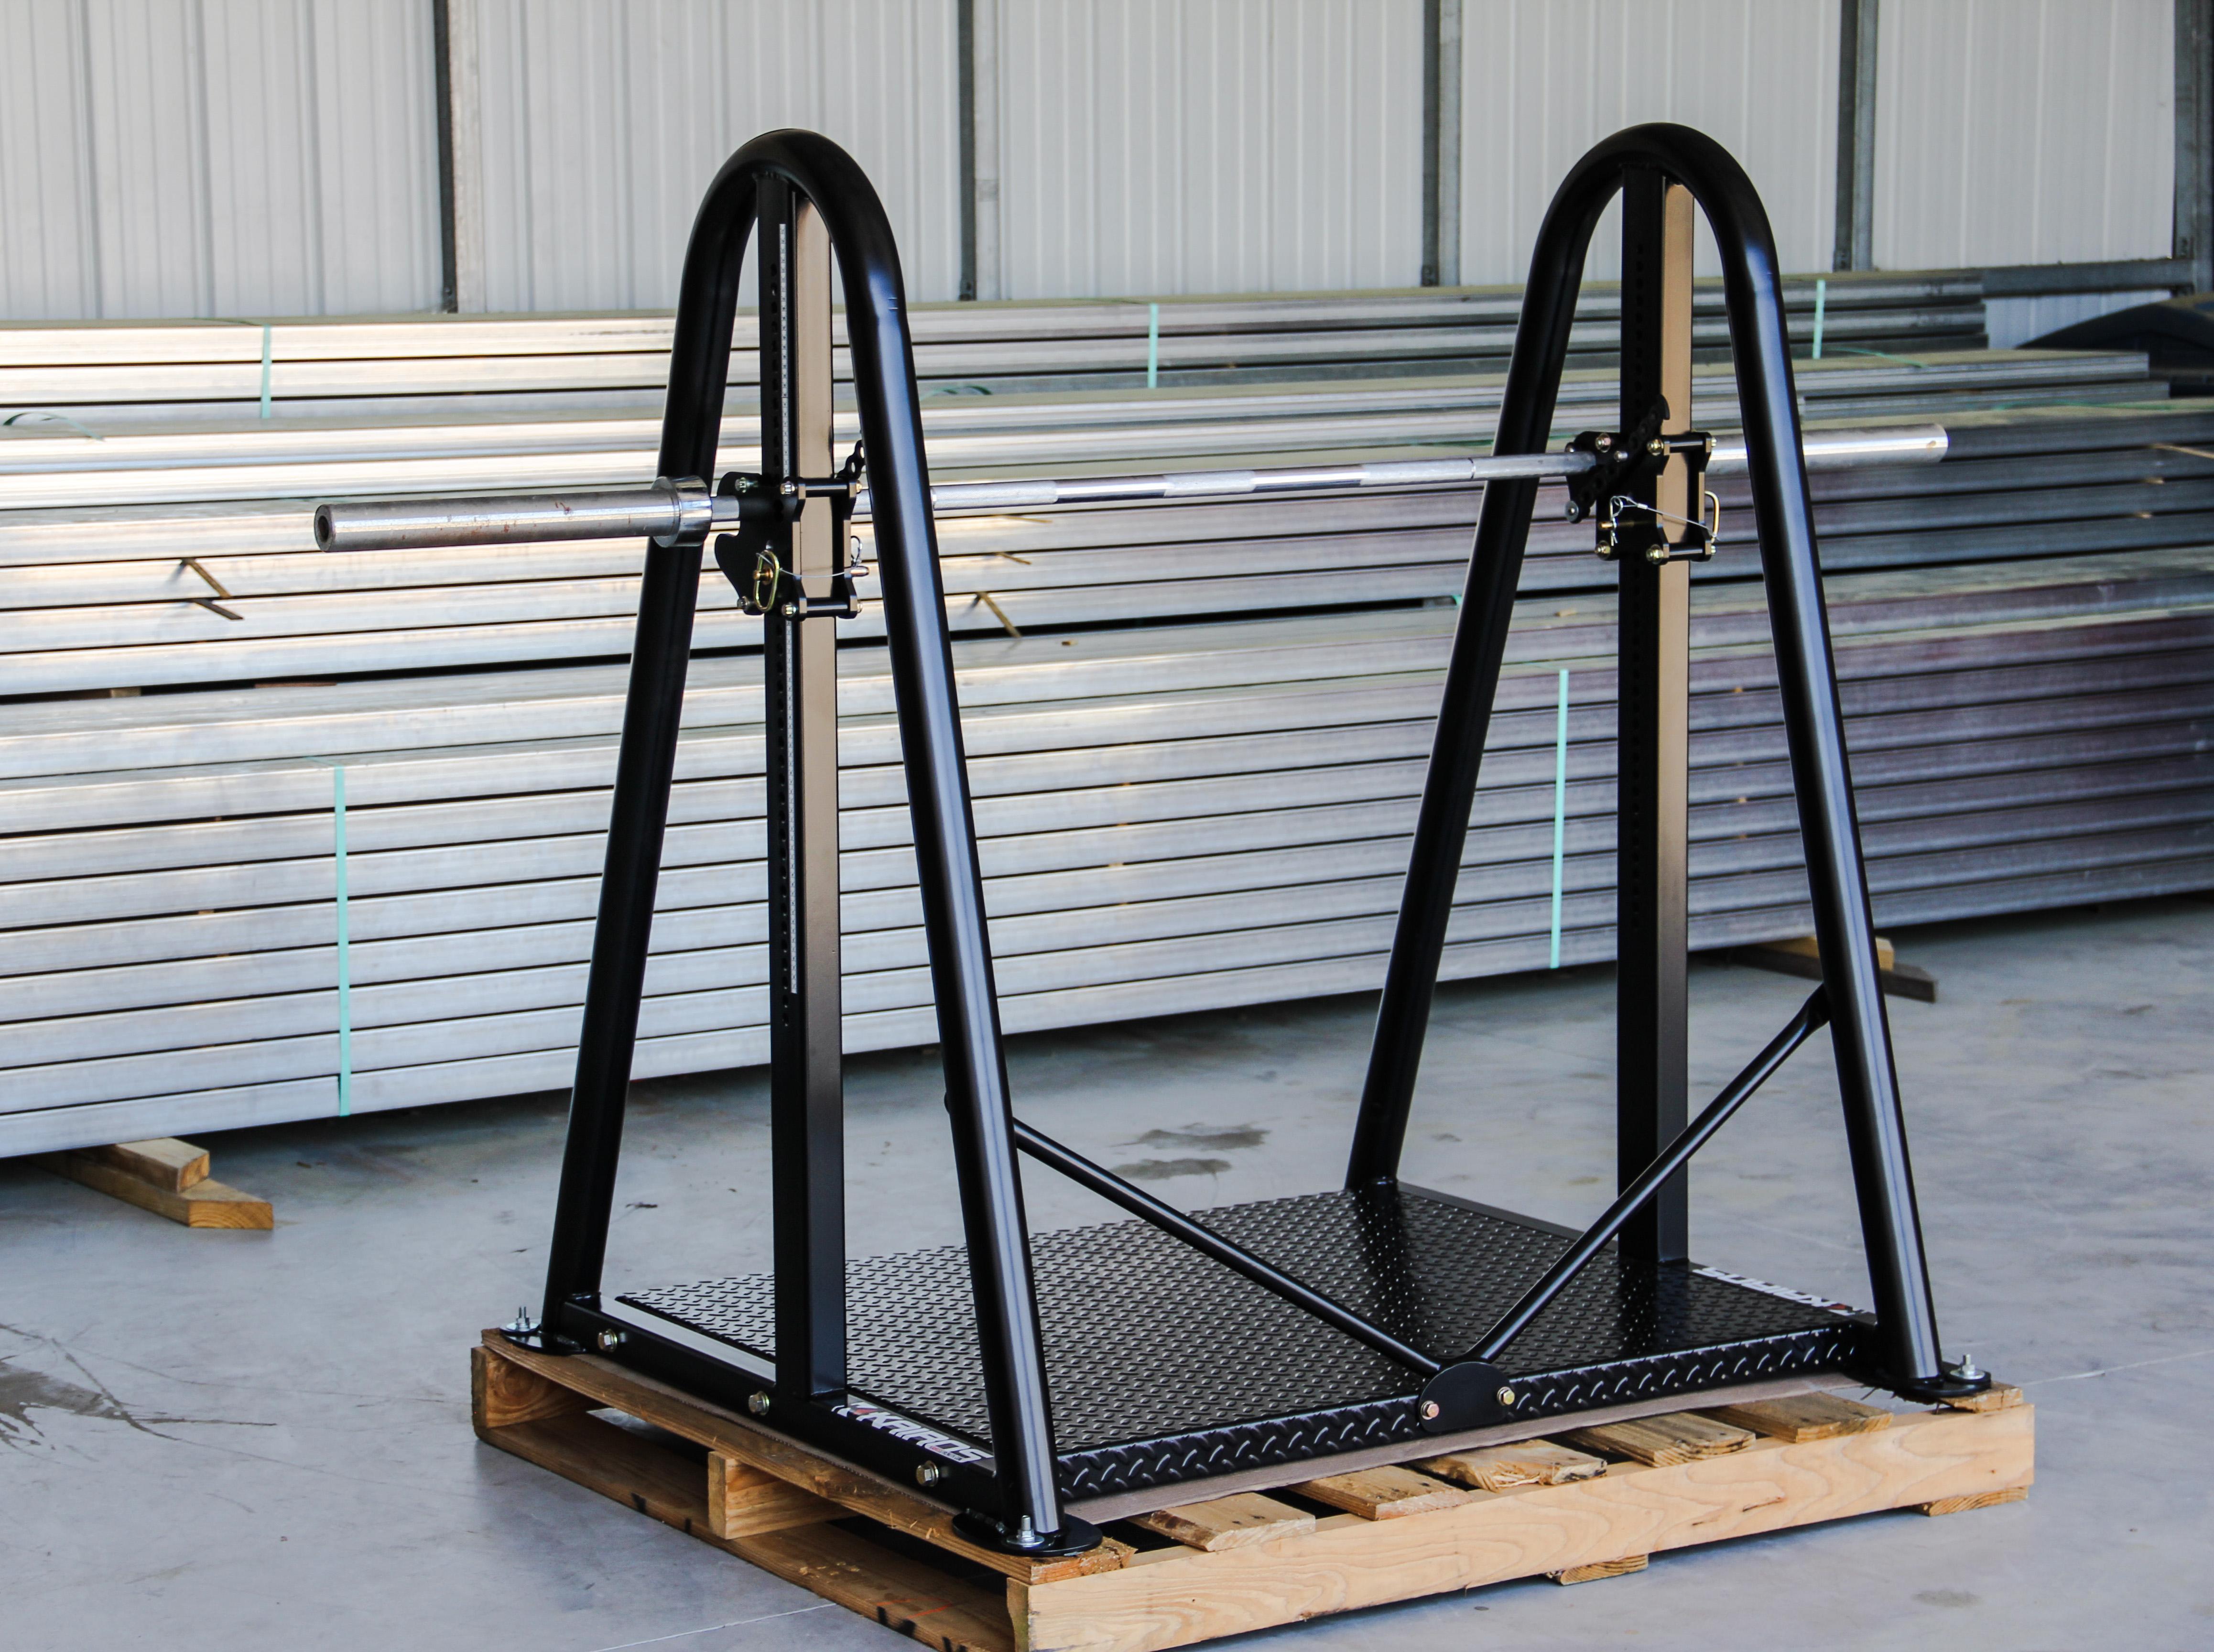 Isometric Mid Thigh Pull (IMTP) Rack